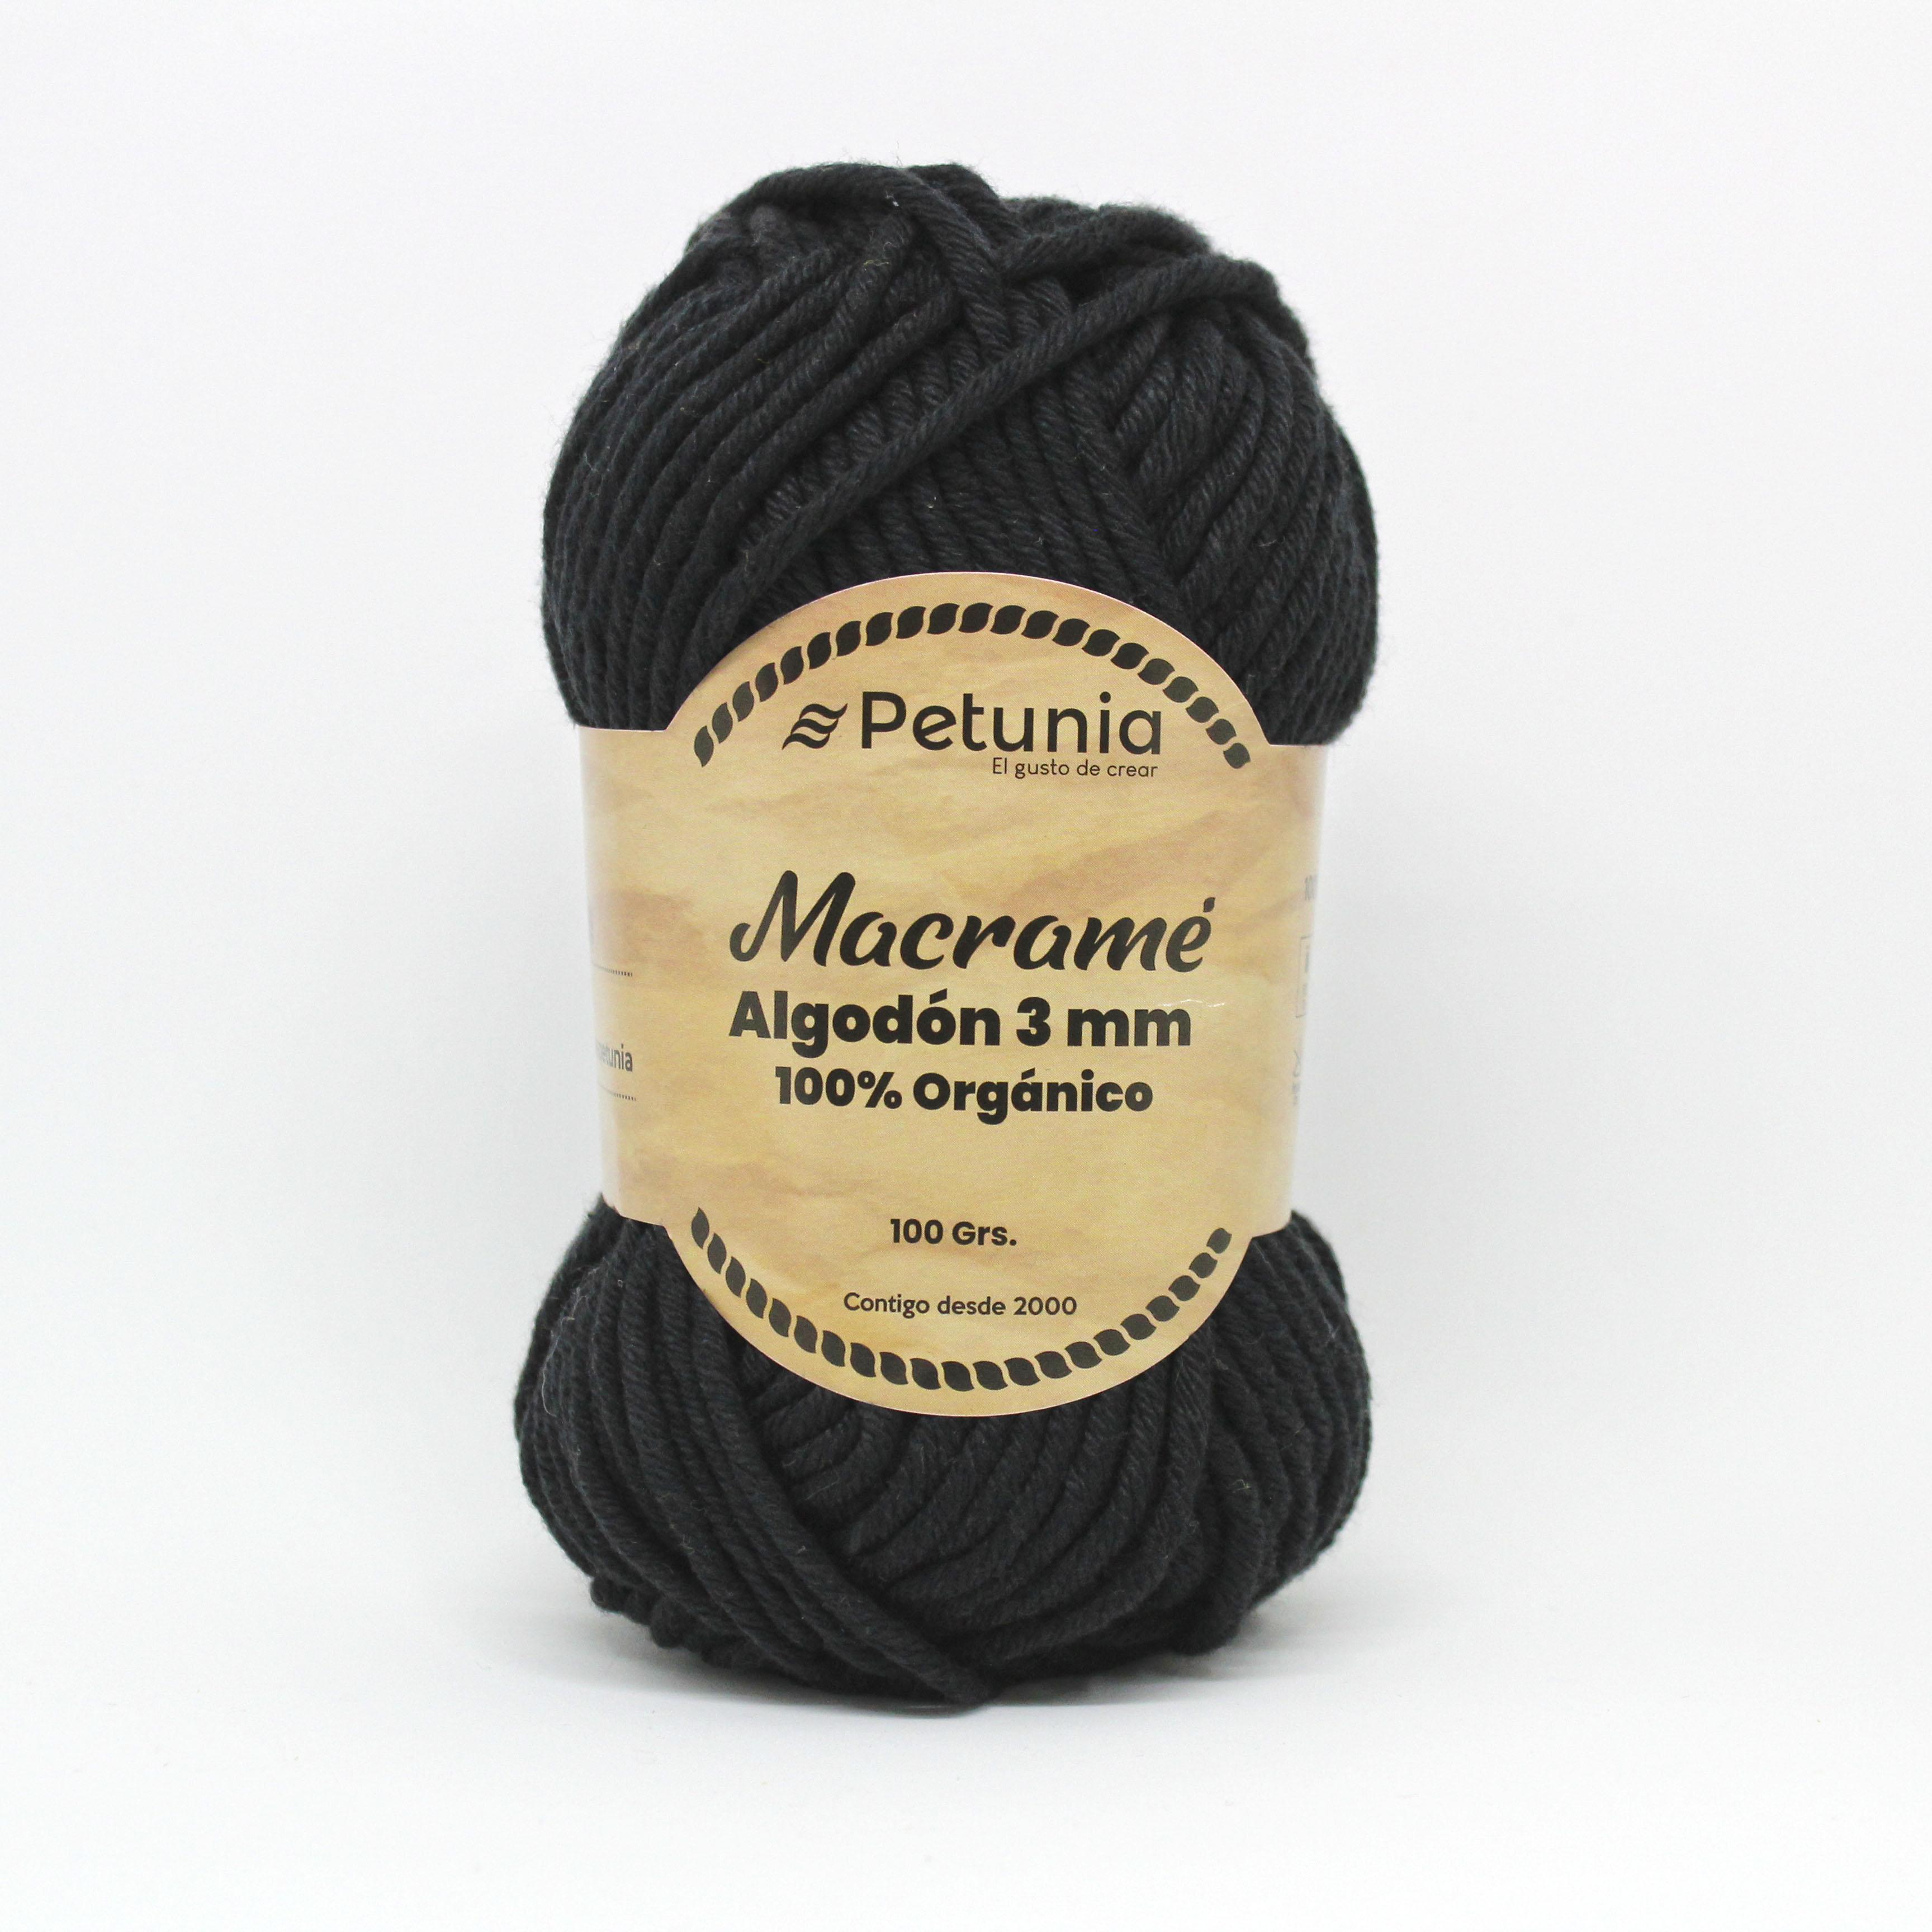 MACRAME ALGODON 3 MM - 6003